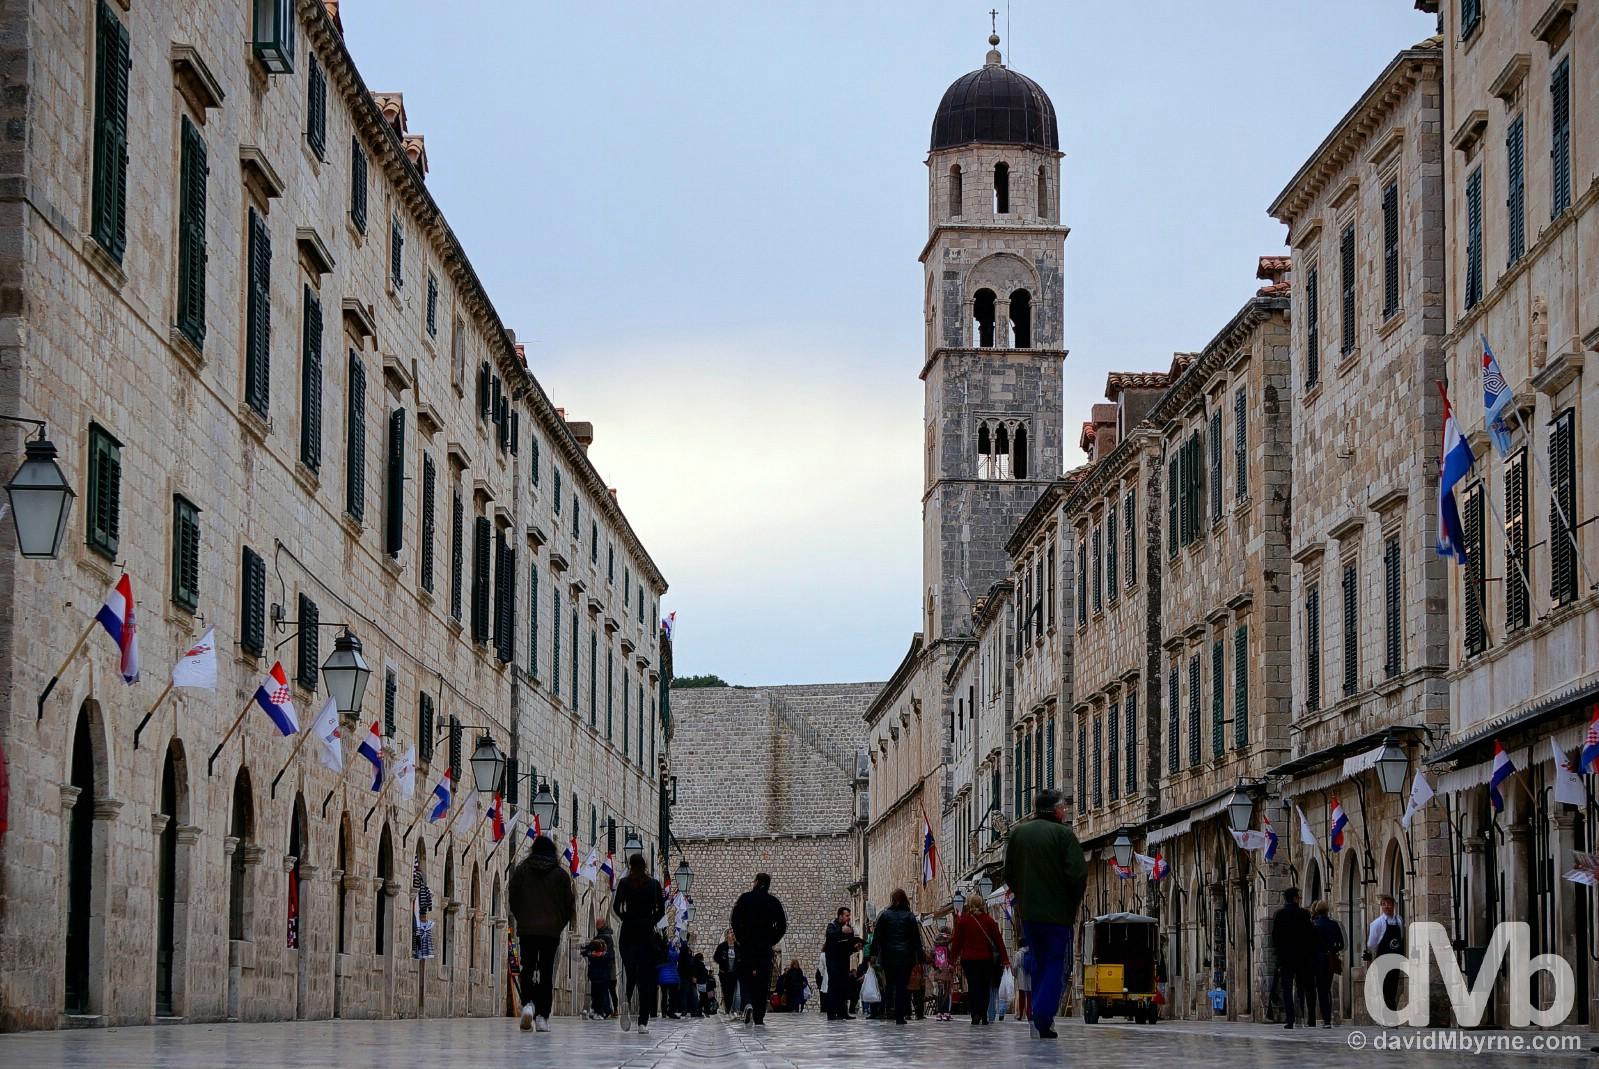 Placa, Old Town, Dubrovnik, Croatia. April 6, 2015.